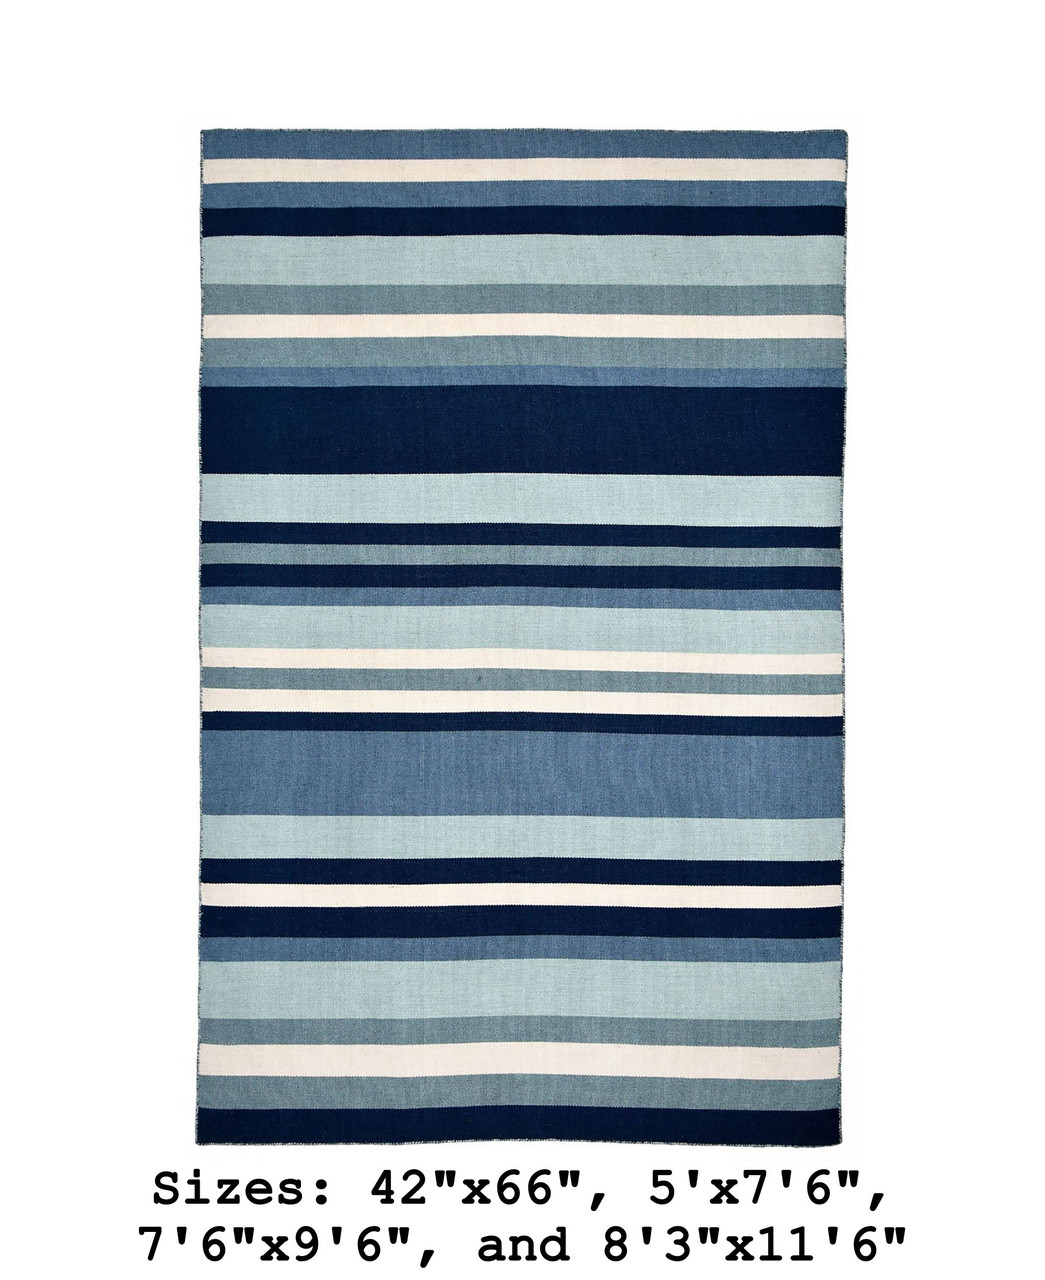 Blue Tribeca Stripes Indoor/Outdoor Rug - Large Rectangle